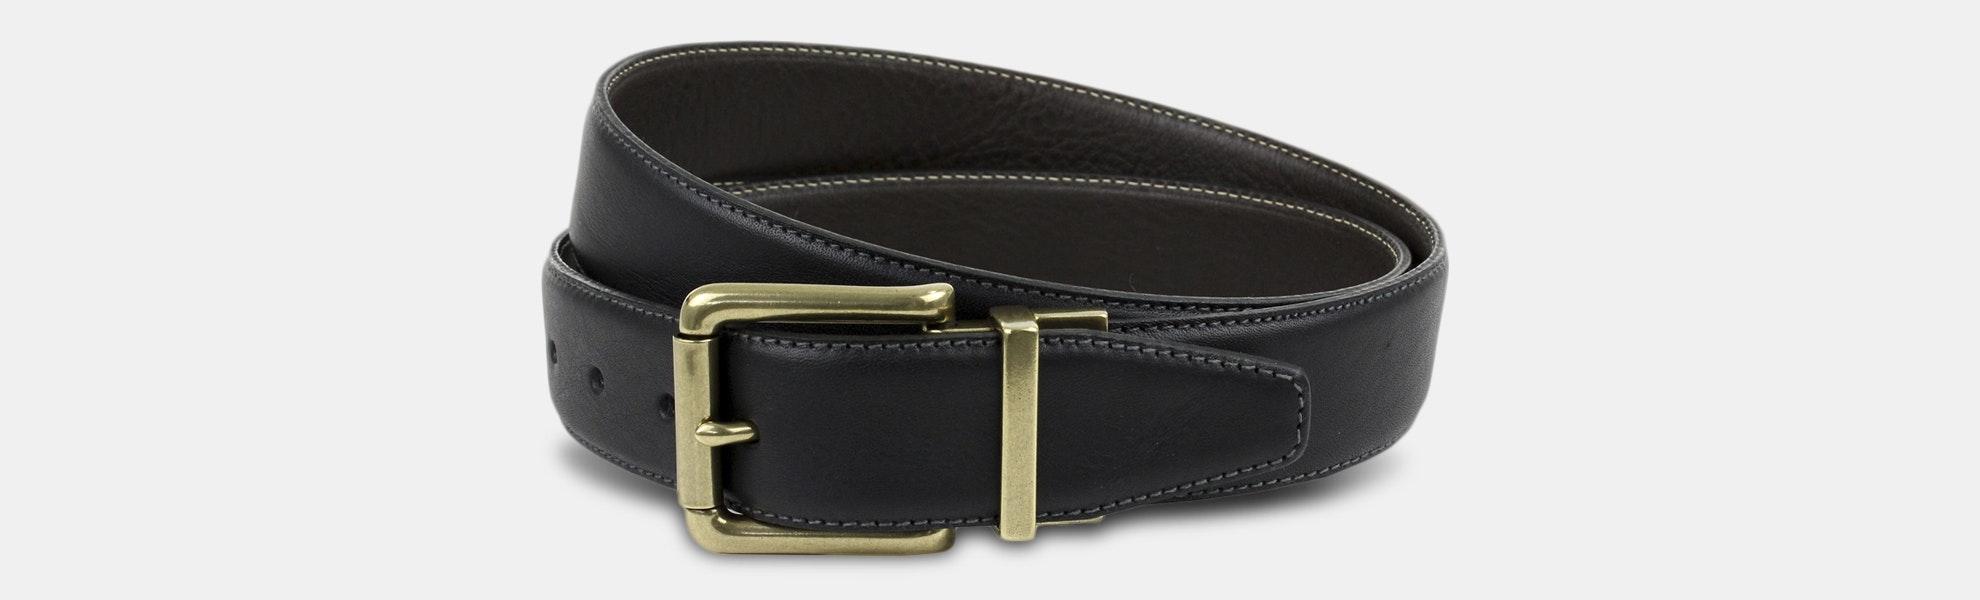 The British Belt Co. Gunthorpe Reversible Belt